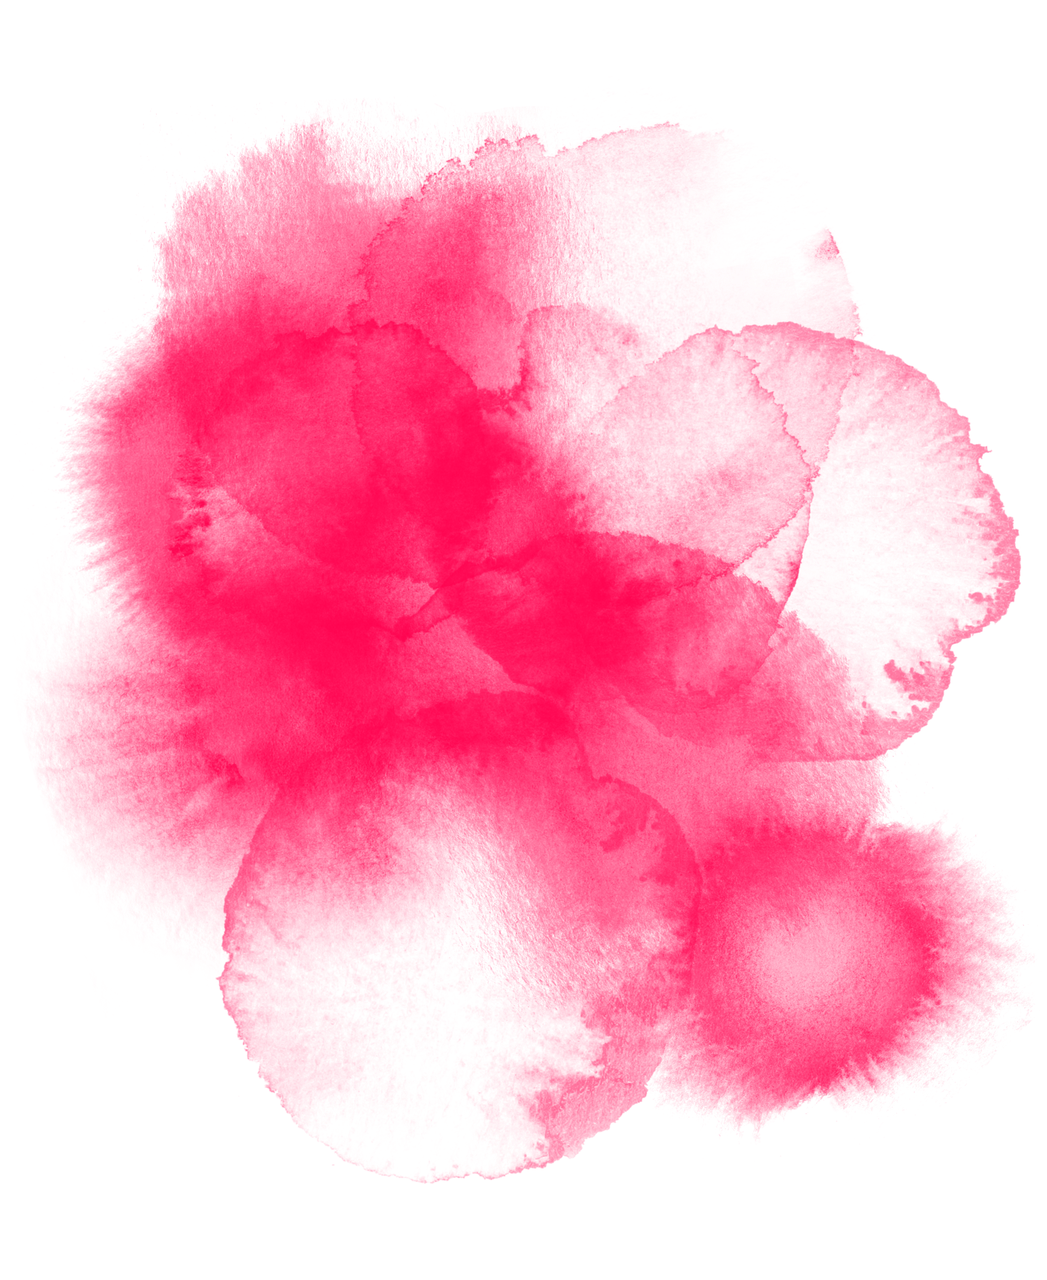 Watercolor Blob Splash   Free image on Pixabay